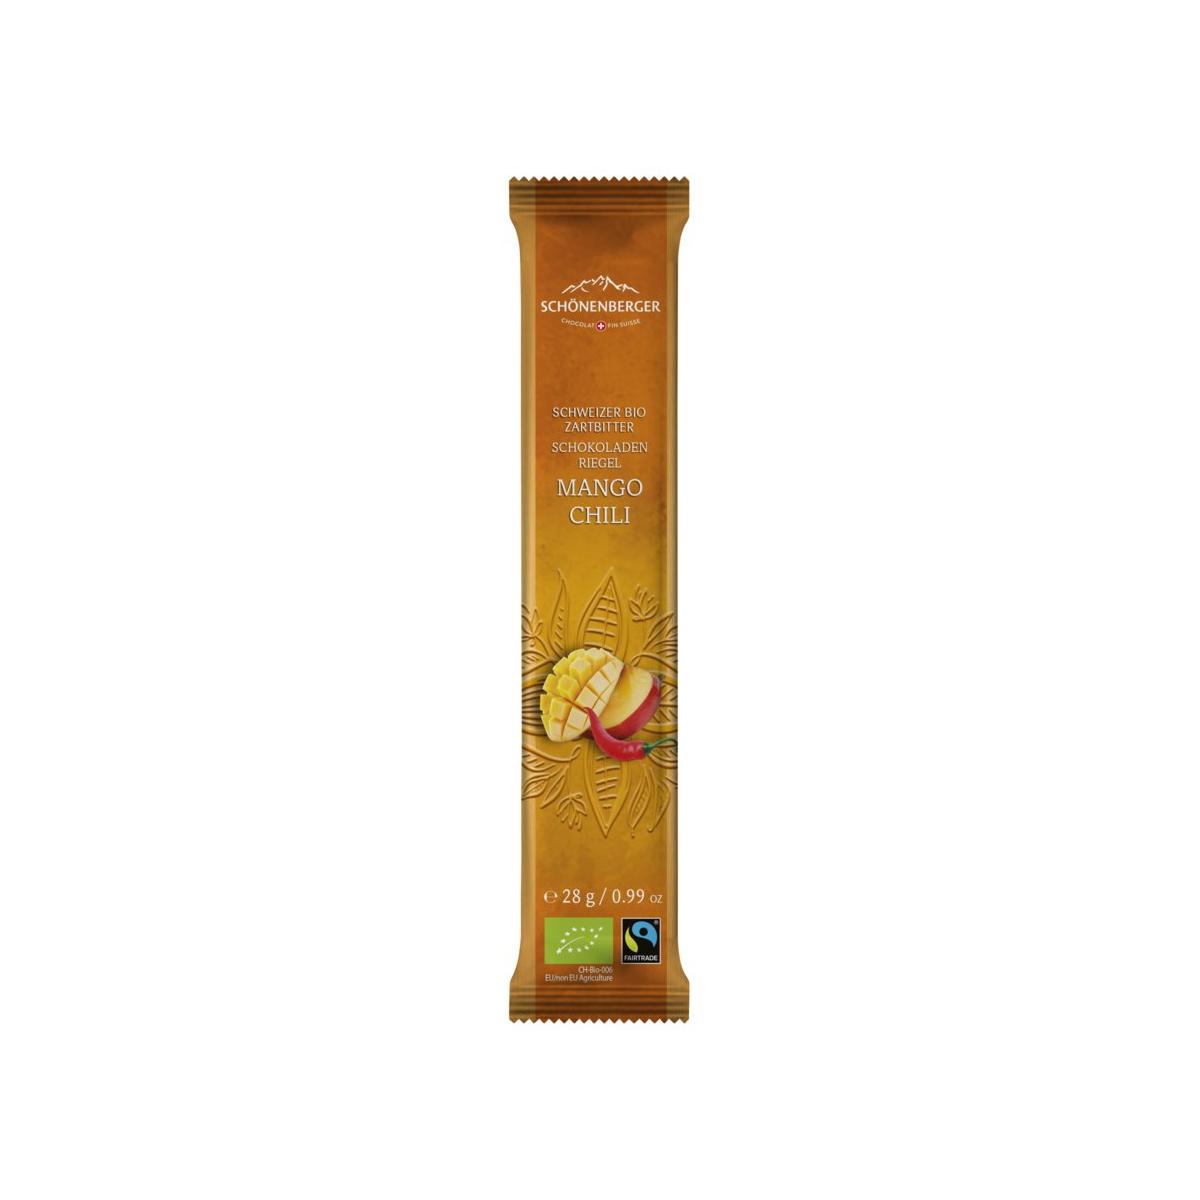 Schoggiriegel Mango Chili